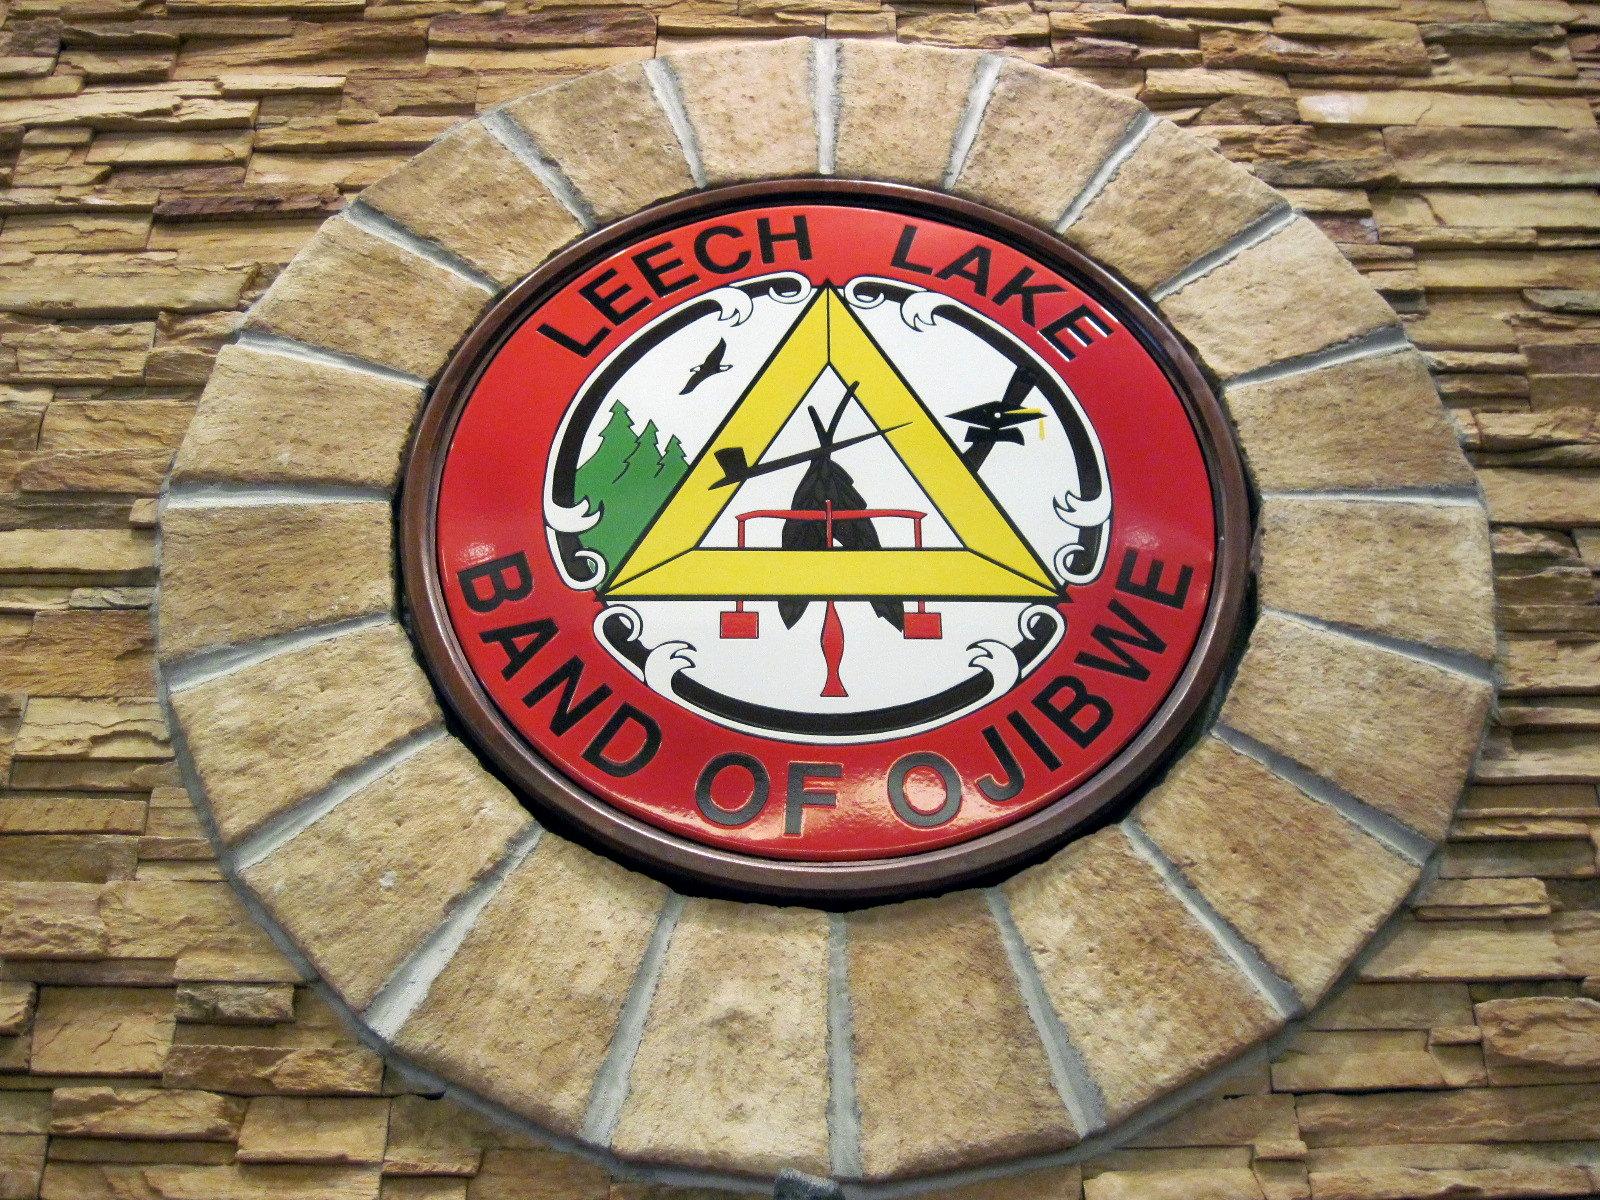 Leech lake casino huge gambling debts